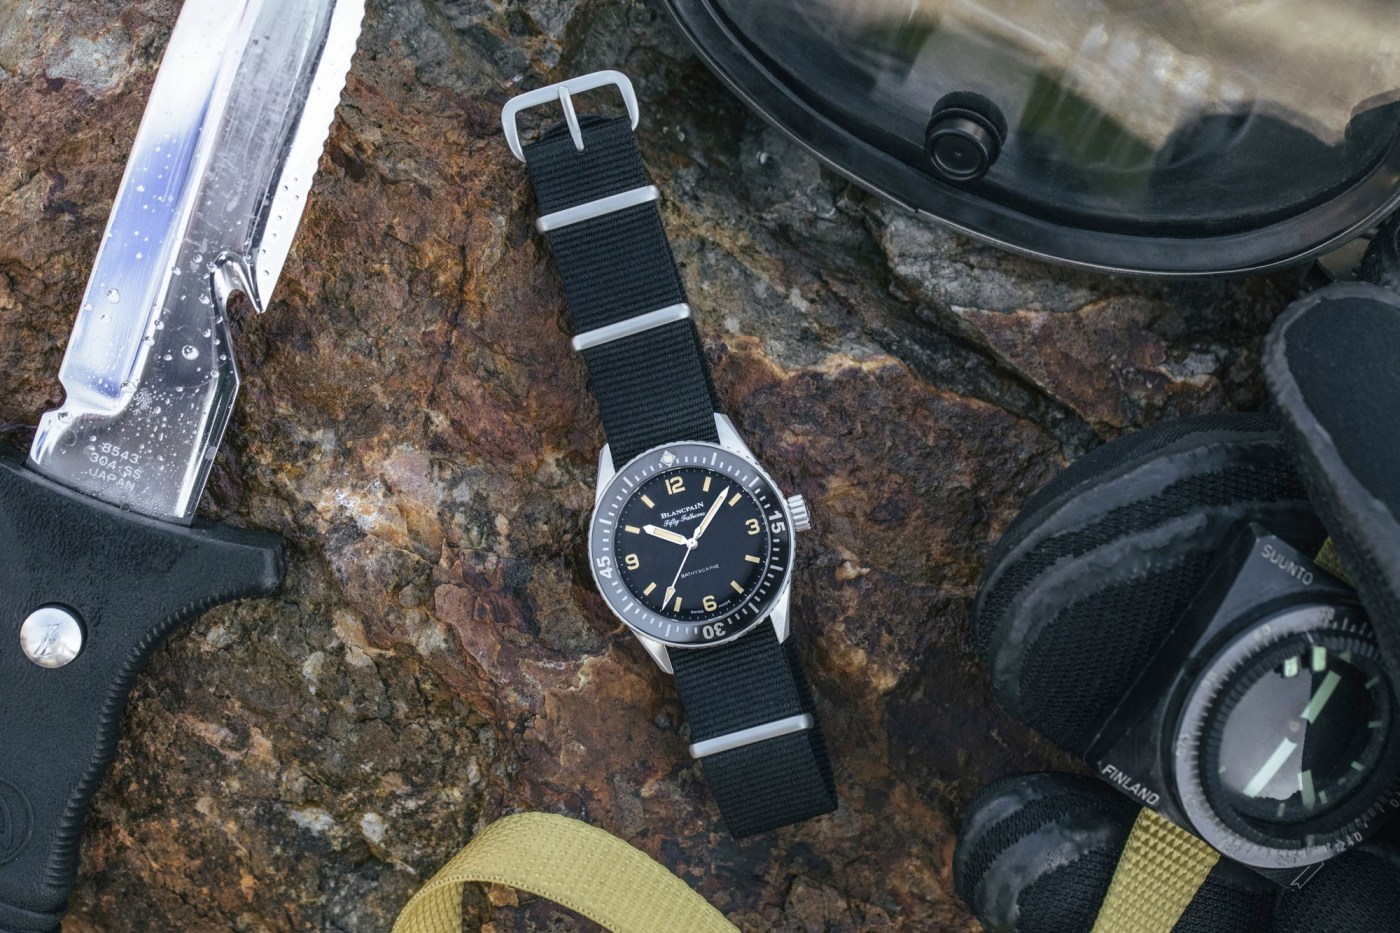 Hodinkee x Blancpain diving lifestyle shot